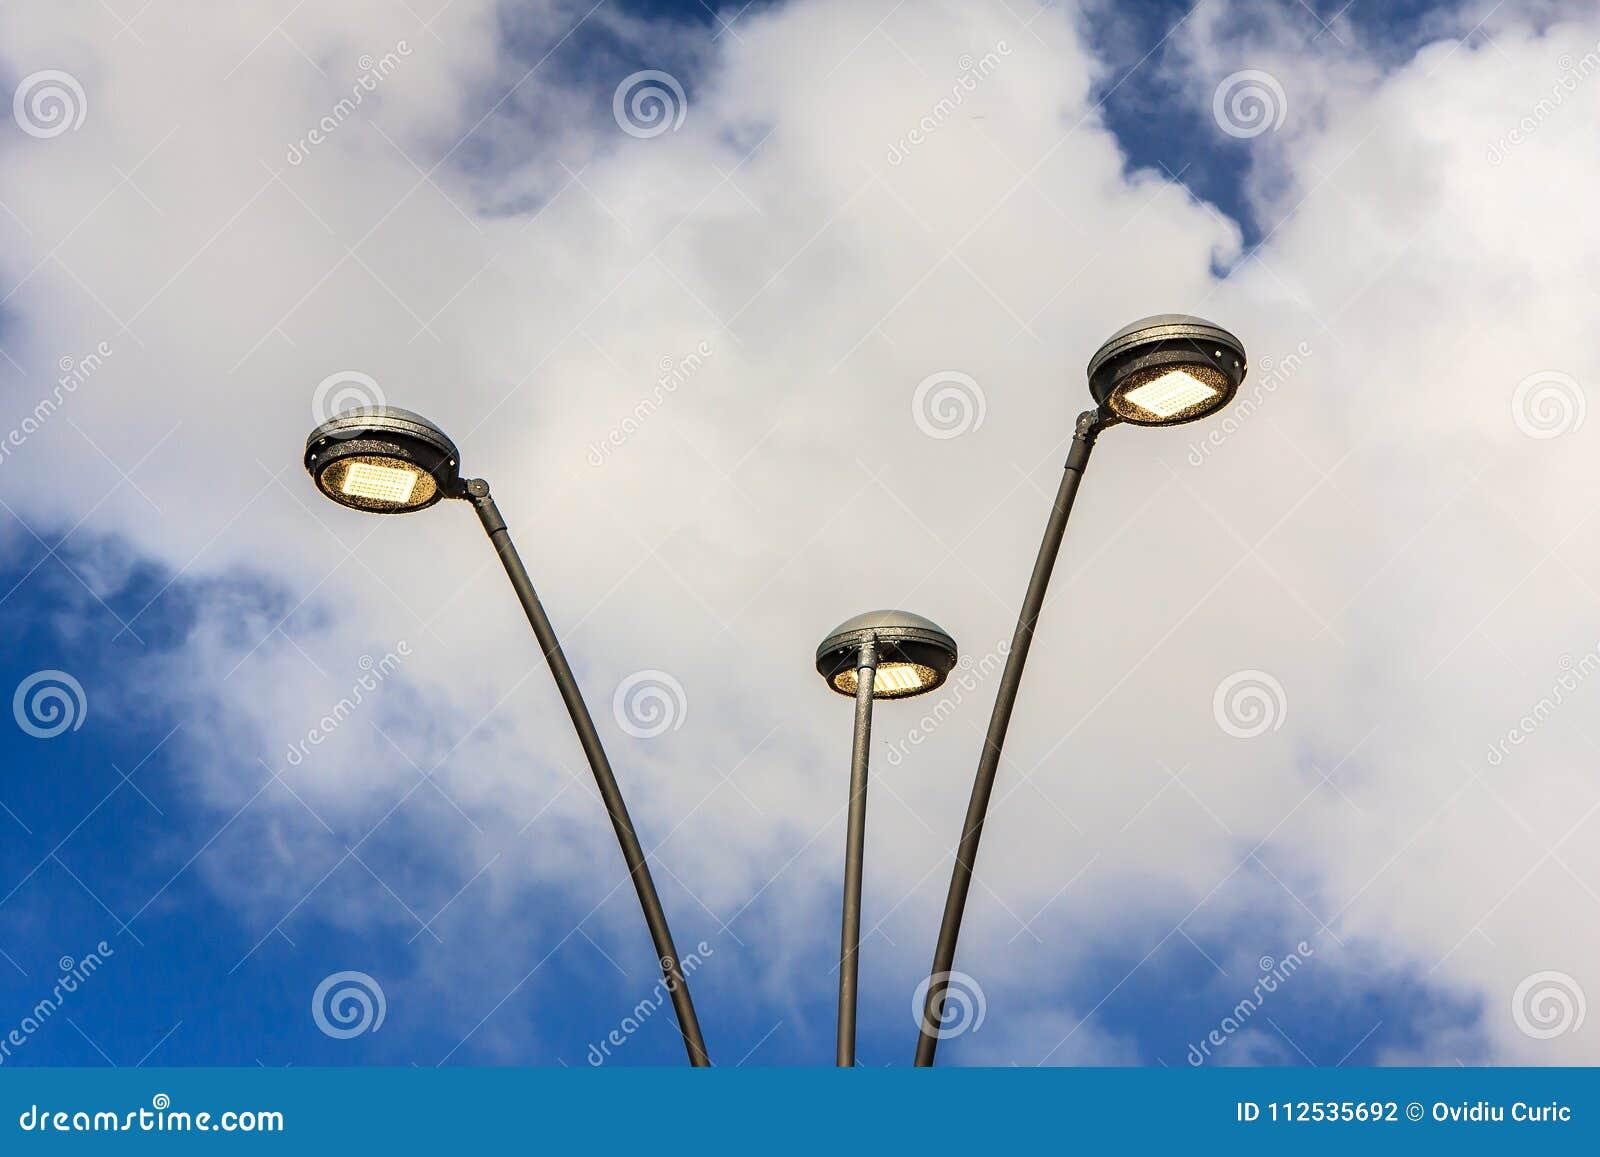 Pali curvi luce moderna del led illuminazione stradale fotografia